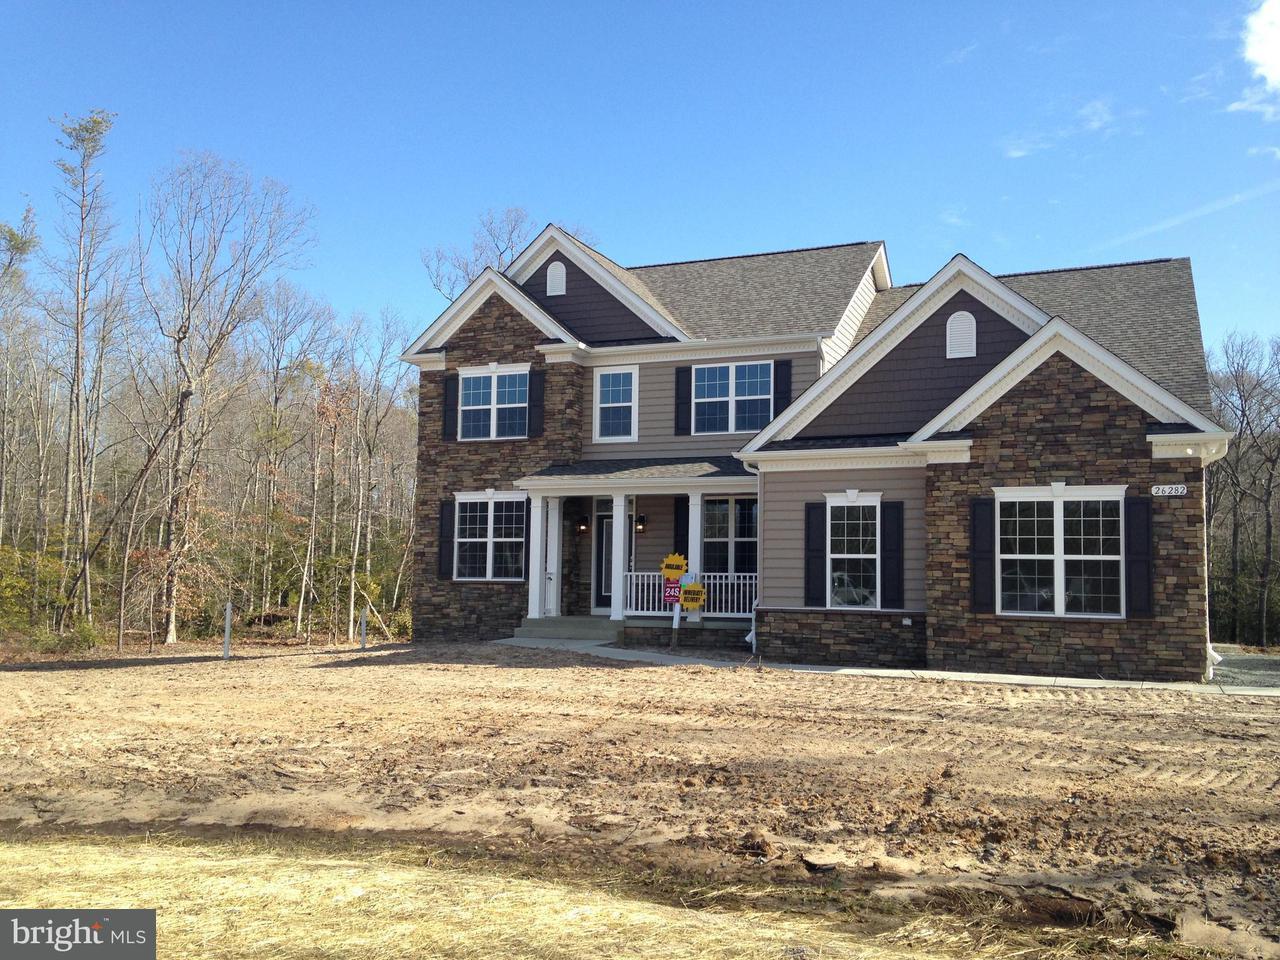 Villa per Vendita alle ore 26282 Woodside Court 26282 Woodside Court Mechanicsville, Maryland 20659 Stati Uniti